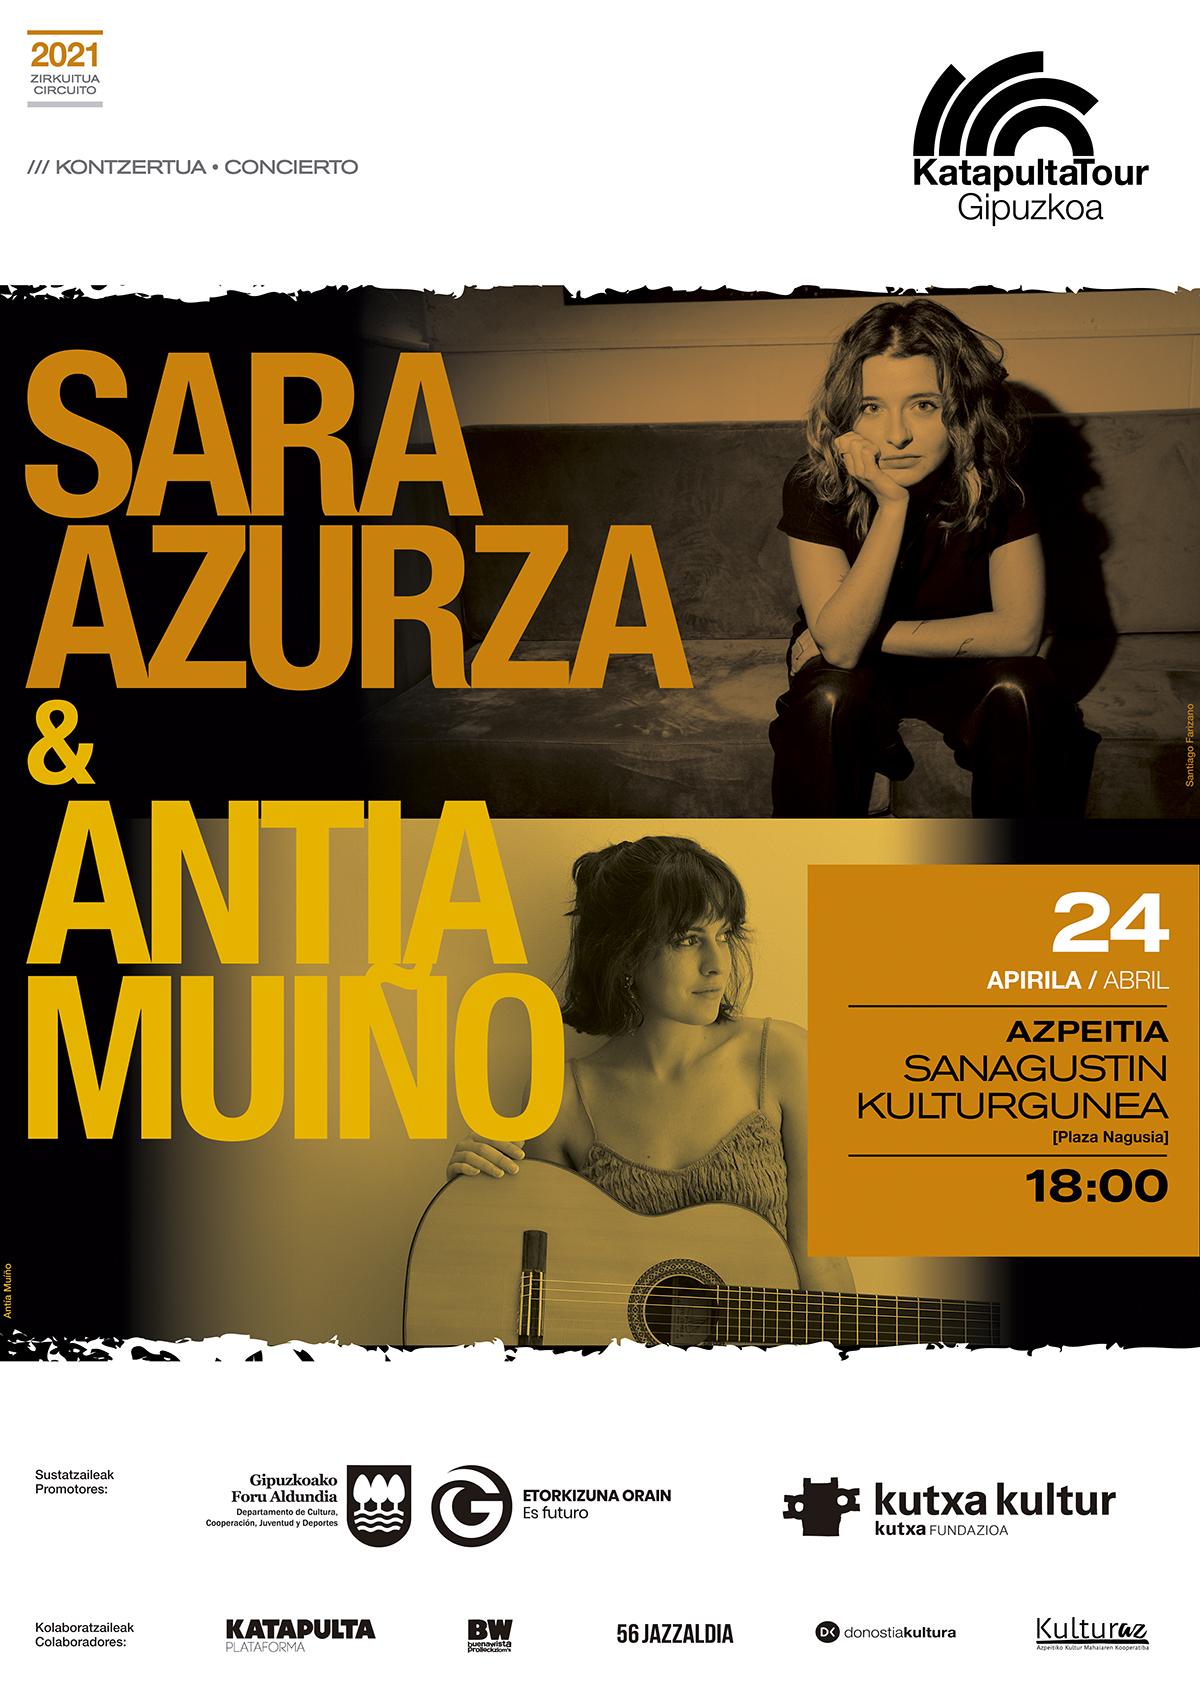 Kontzertua:  SARA AZURZA + ANTÍA MUÍÑO